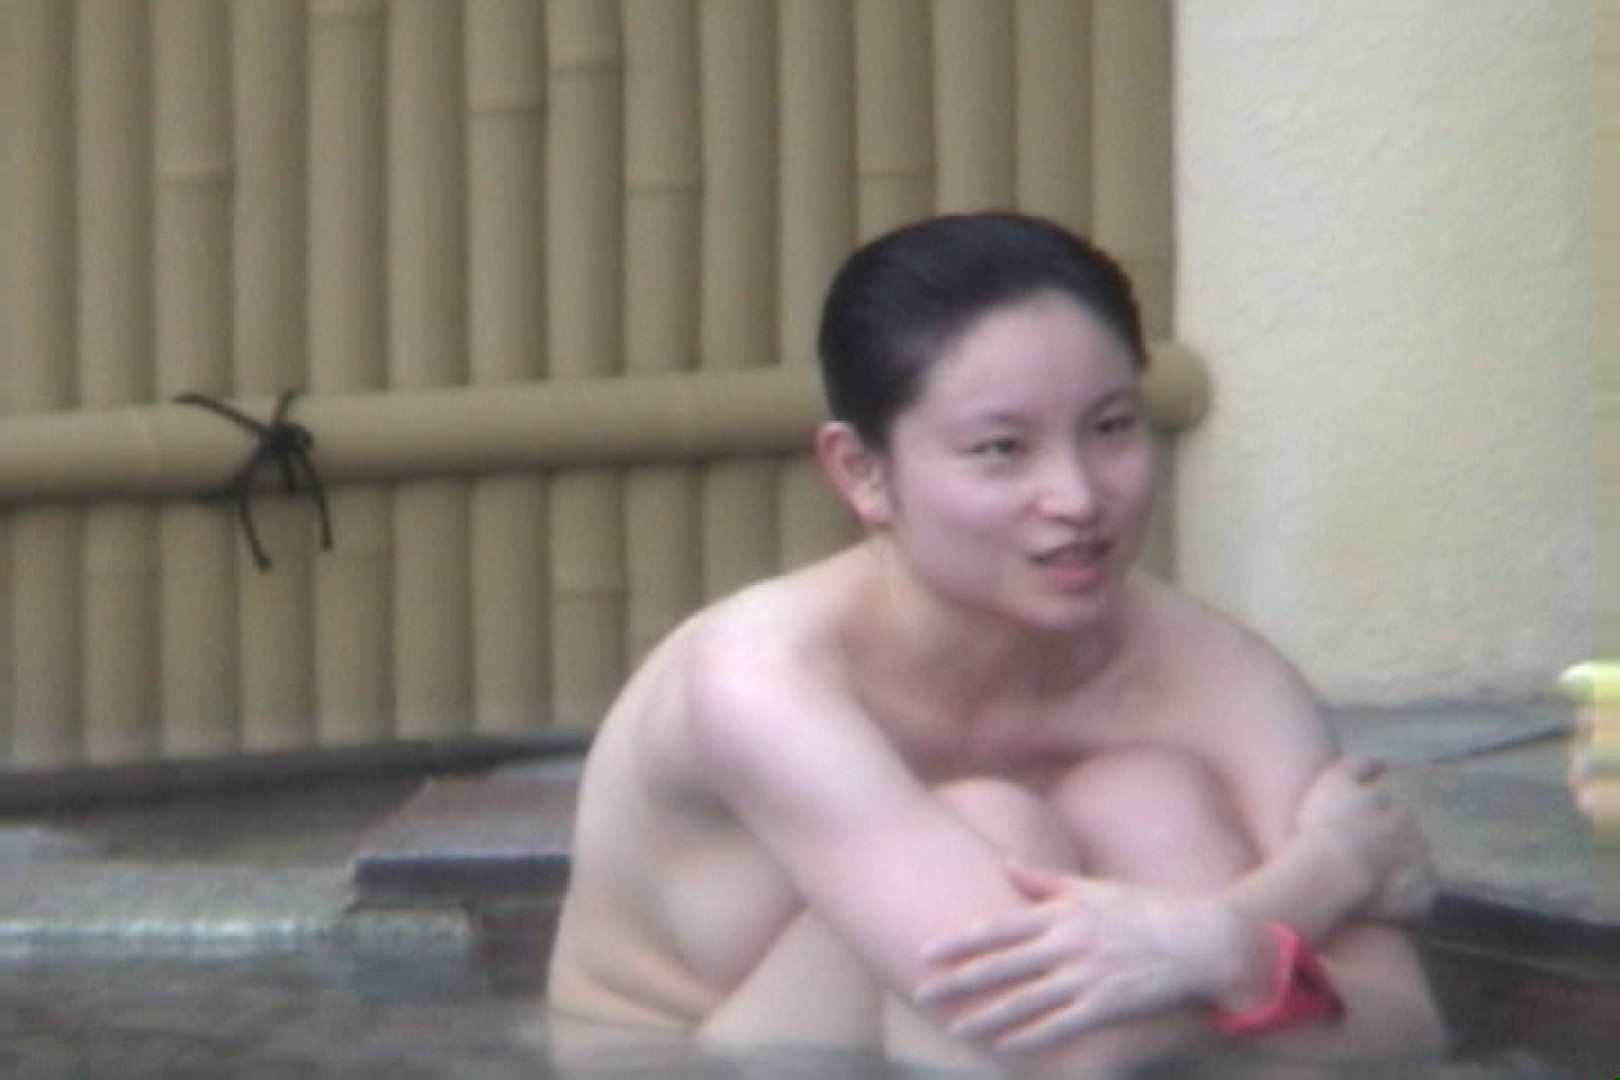 Aquaな露天風呂Vol.45【VIP限定】 HなOL   盗撮  100pic 45